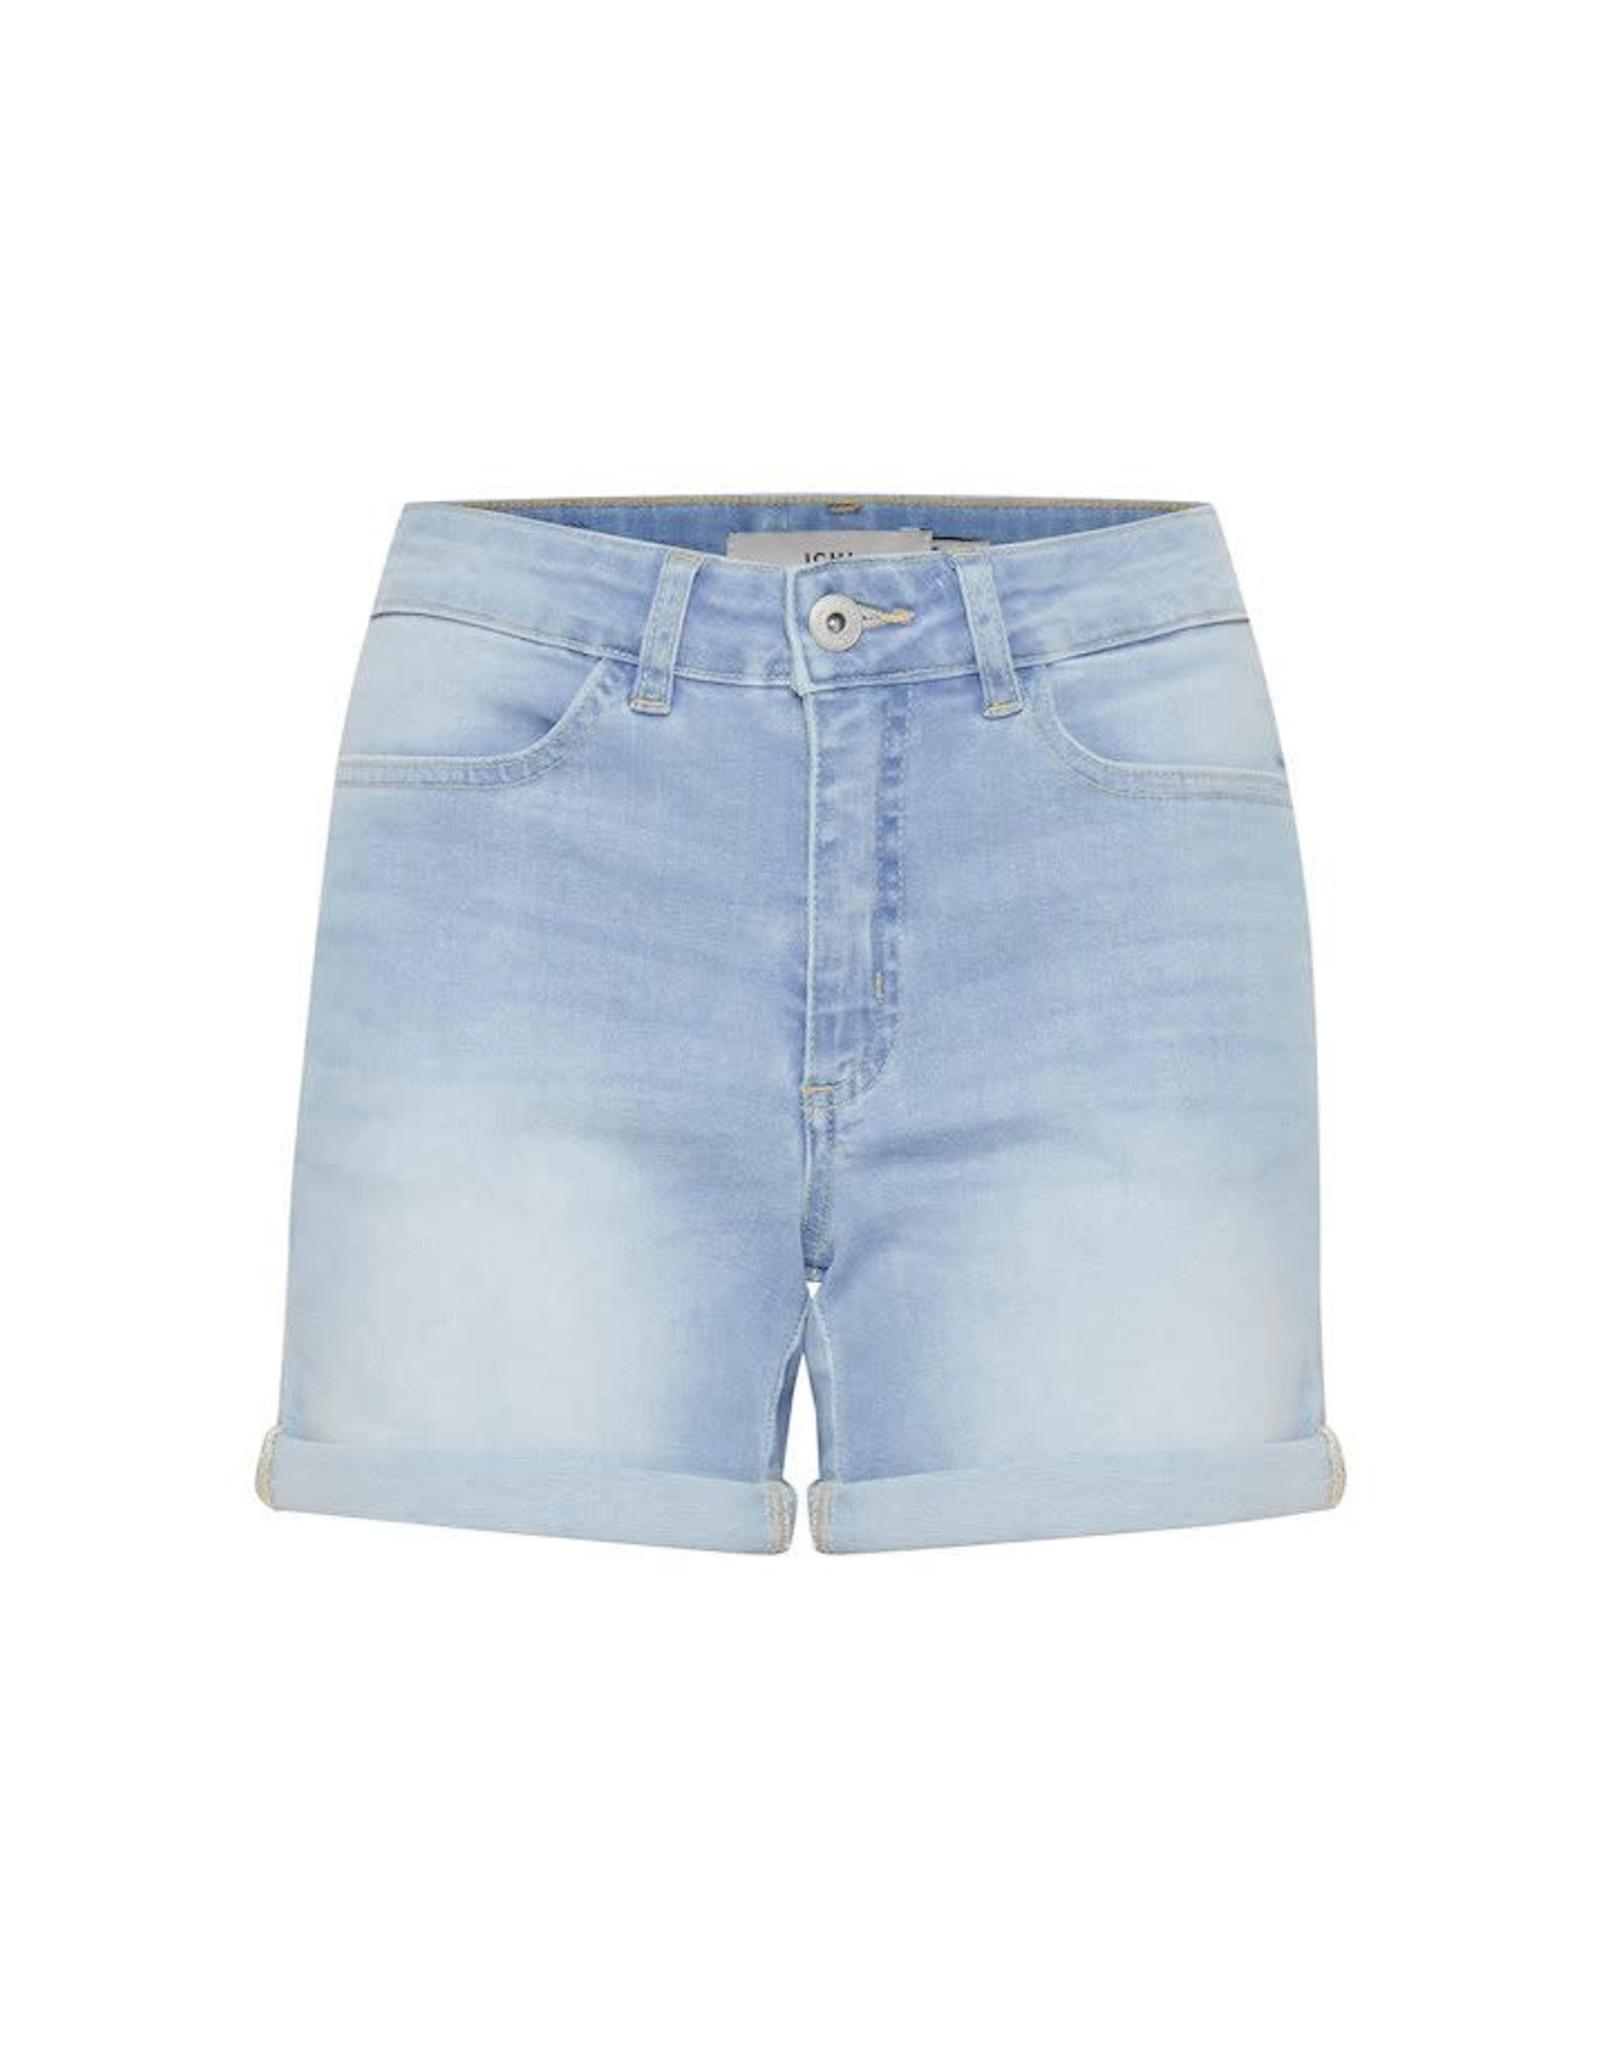 ICHI ICHI - Twiggy shorts (light blue)